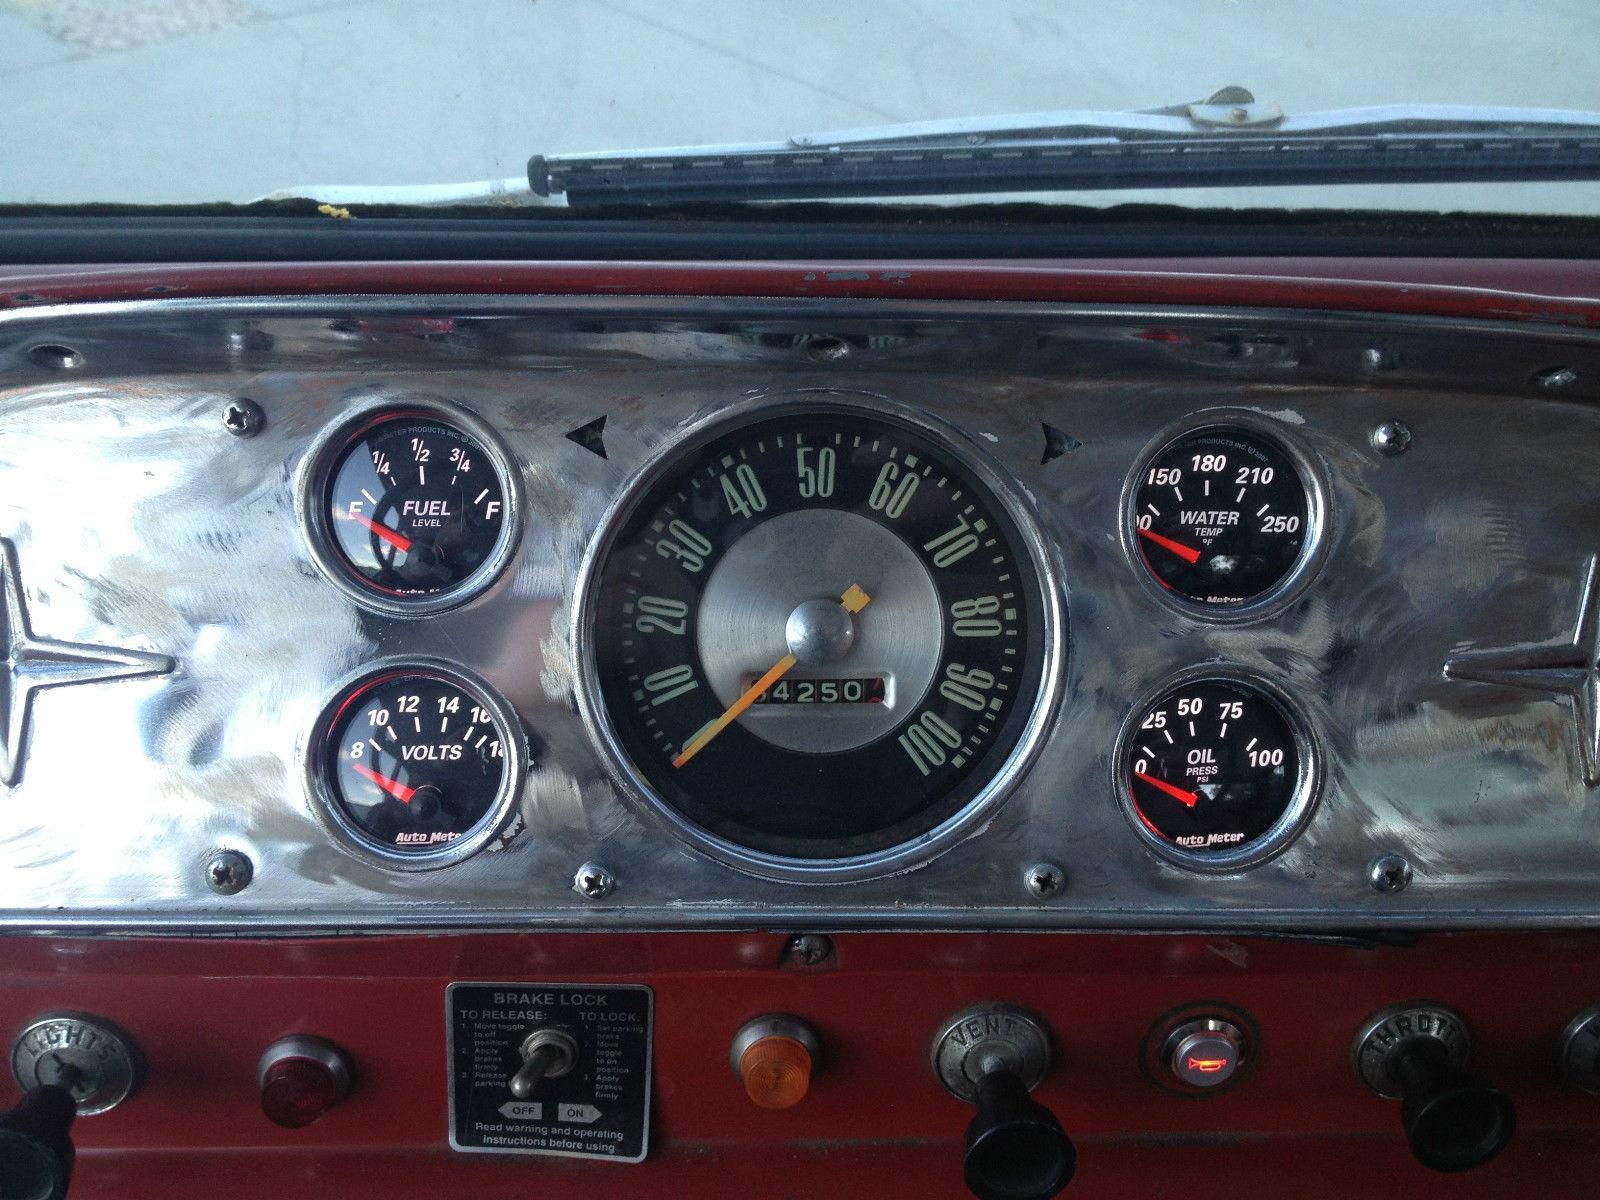 Take A Look At This 1958 Ford C 800 Fire Truck Engine Air Brake Diagram Ramp Car Hauler 11